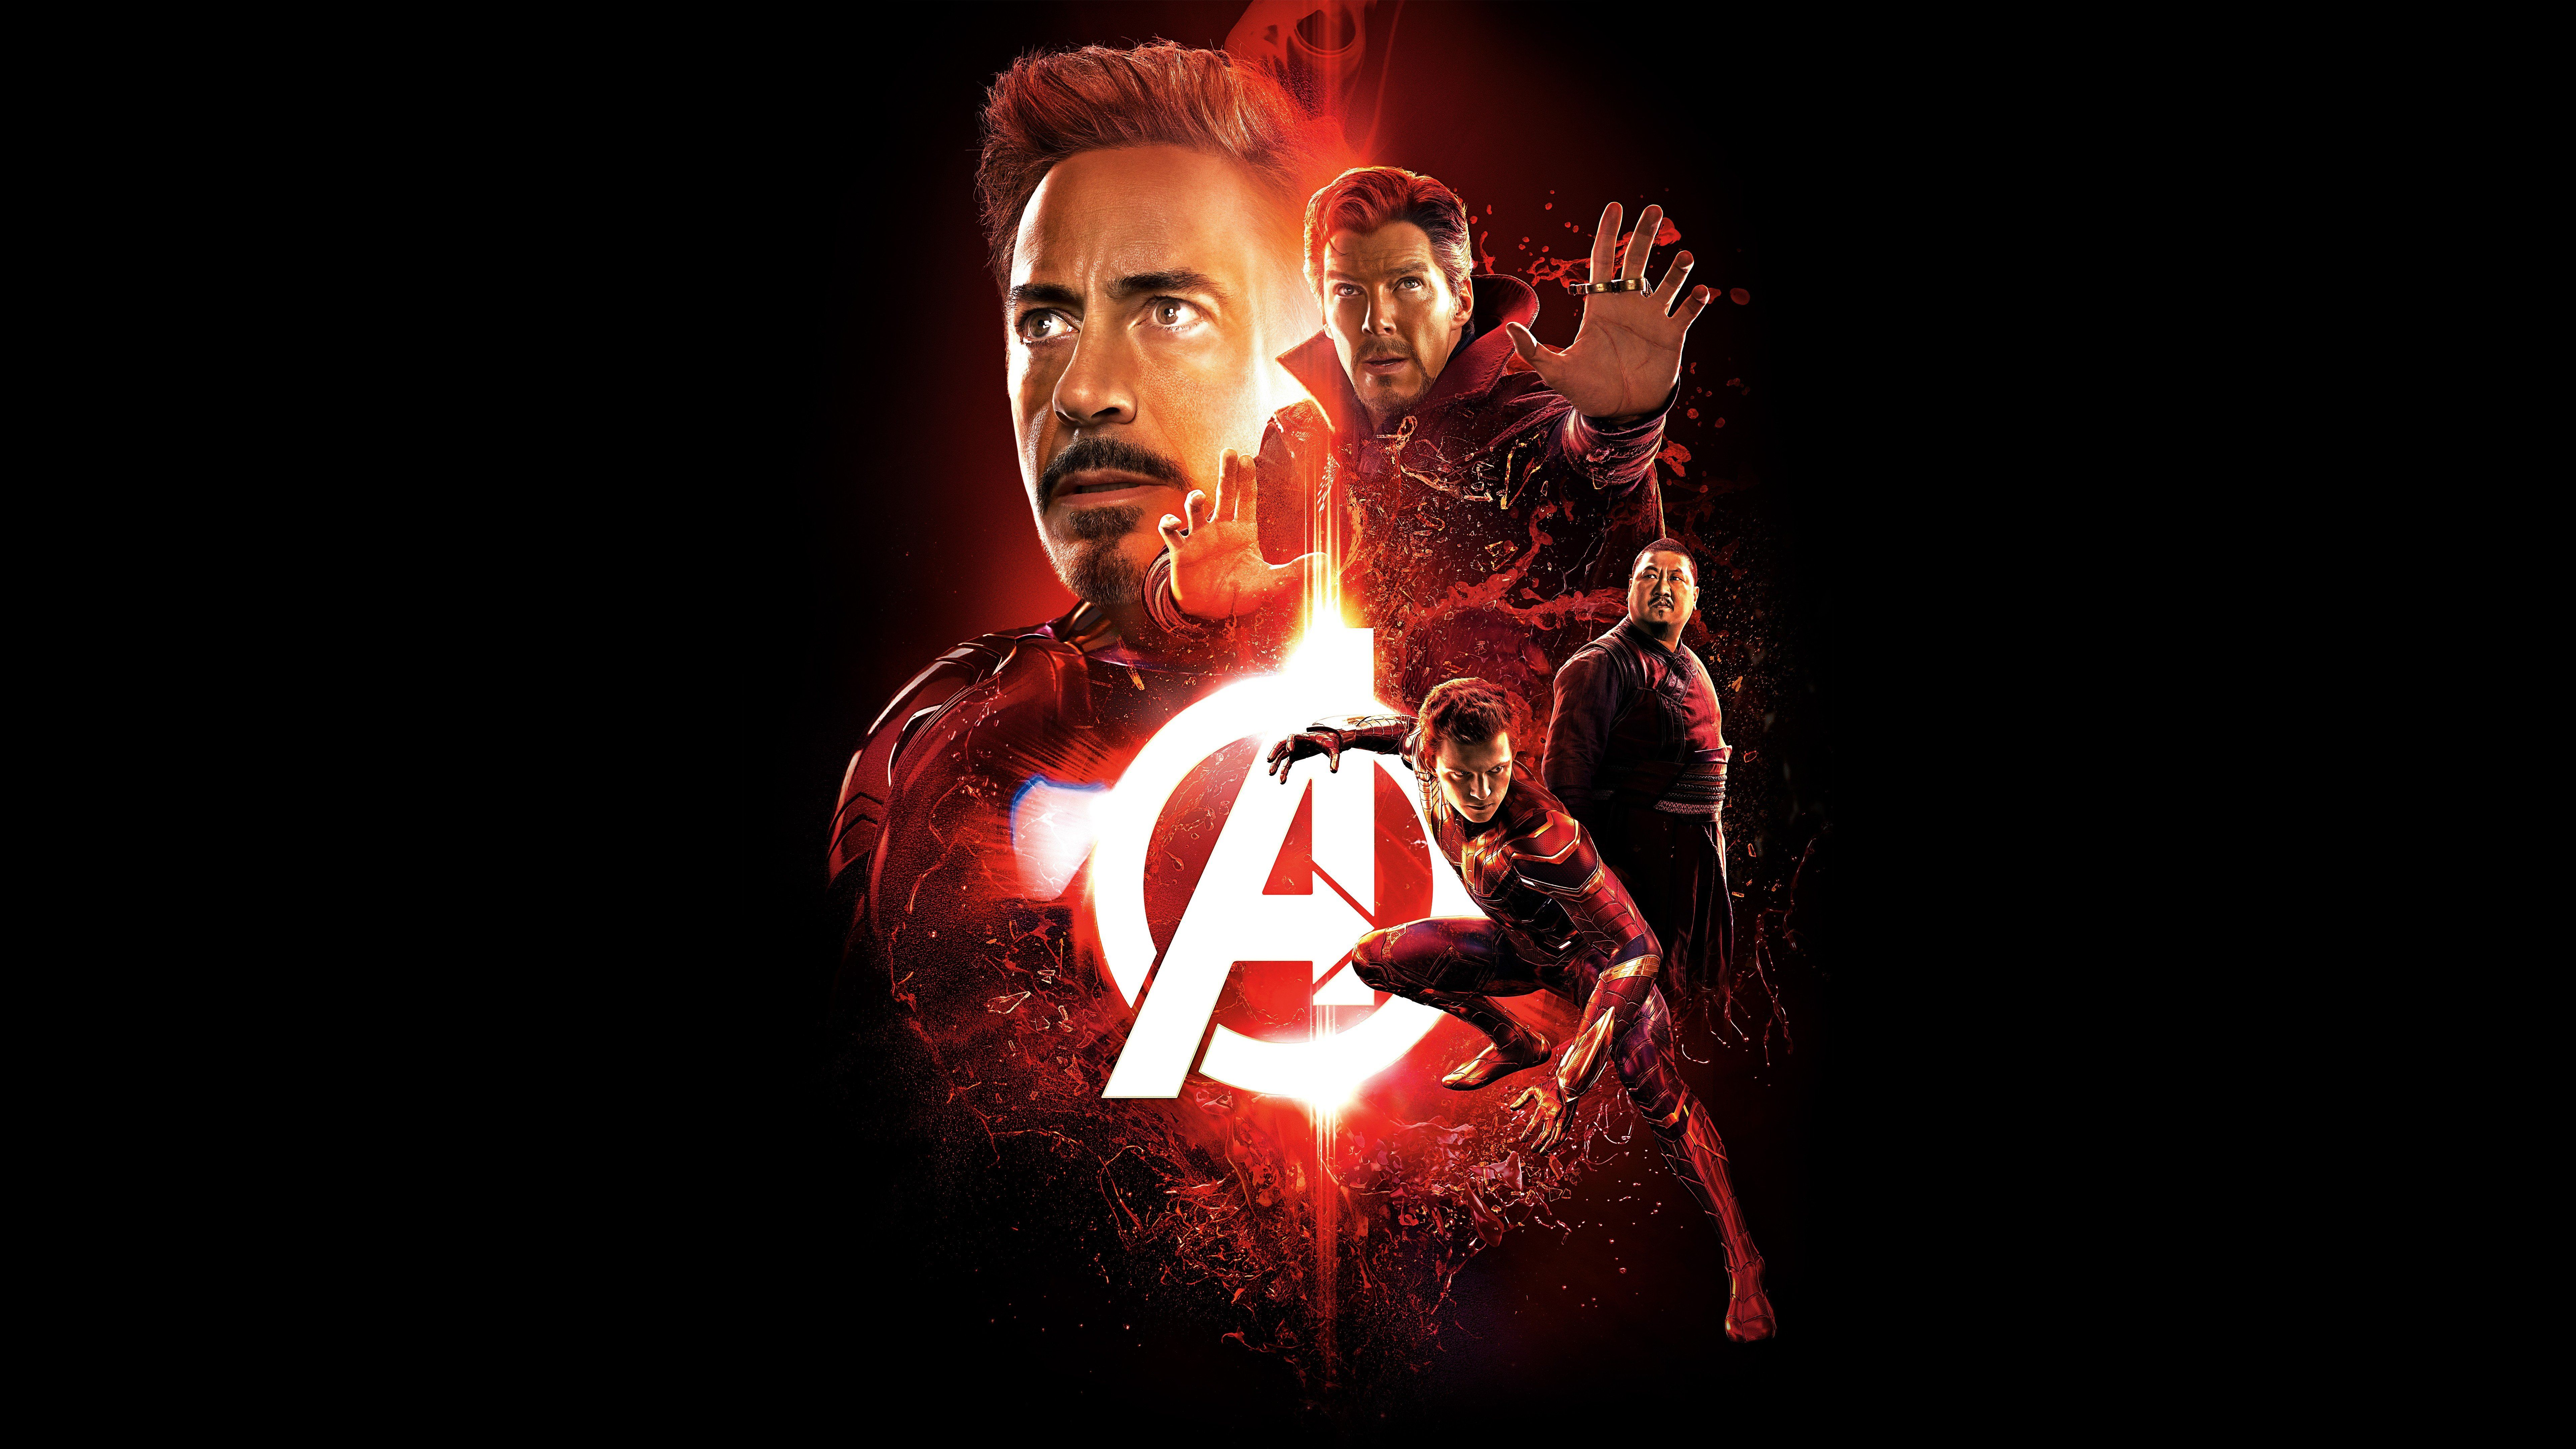 Team Titan 4k Wallpaper Iron Man Hd Wallpaper Iron Man Wallpaper Avengers Wallpaper